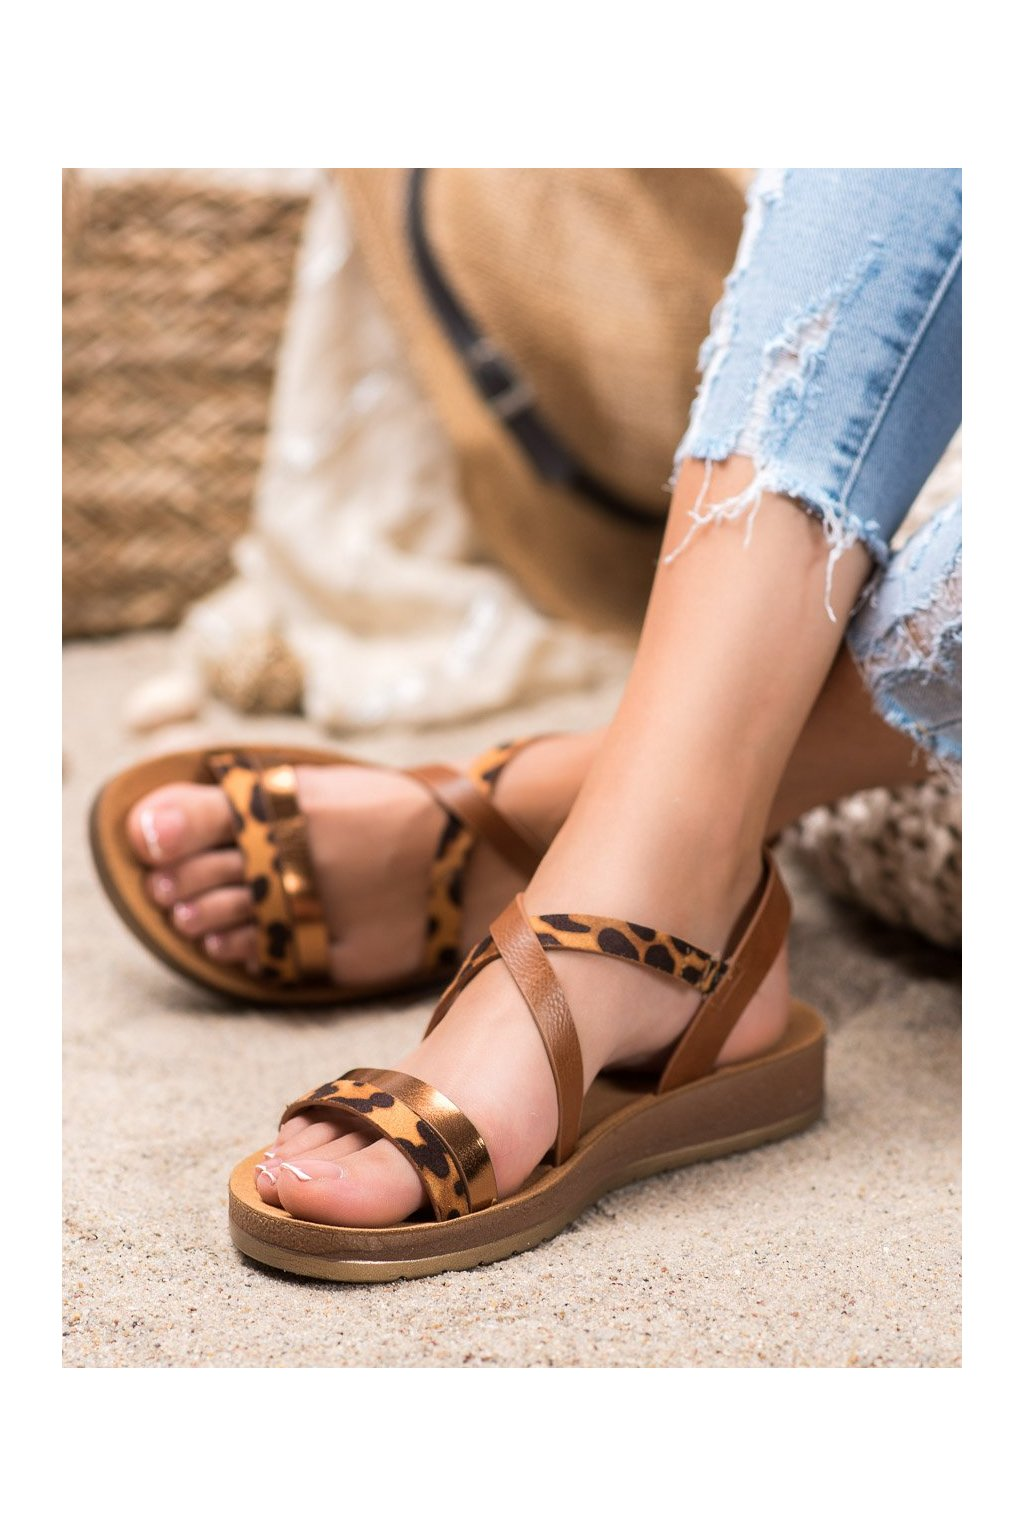 Hnedé sandále Shelovet kod P597C